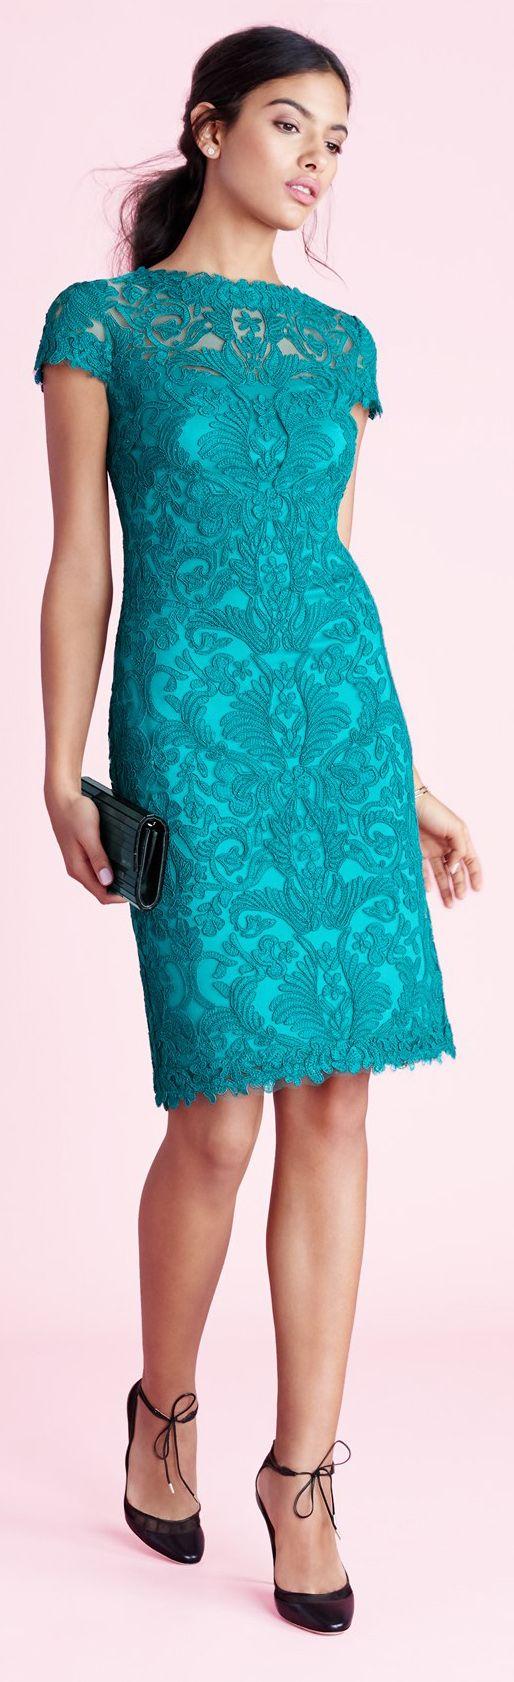 Tadashi Shoji Blue Turquoise Lace Dress Women Fashion Outfit